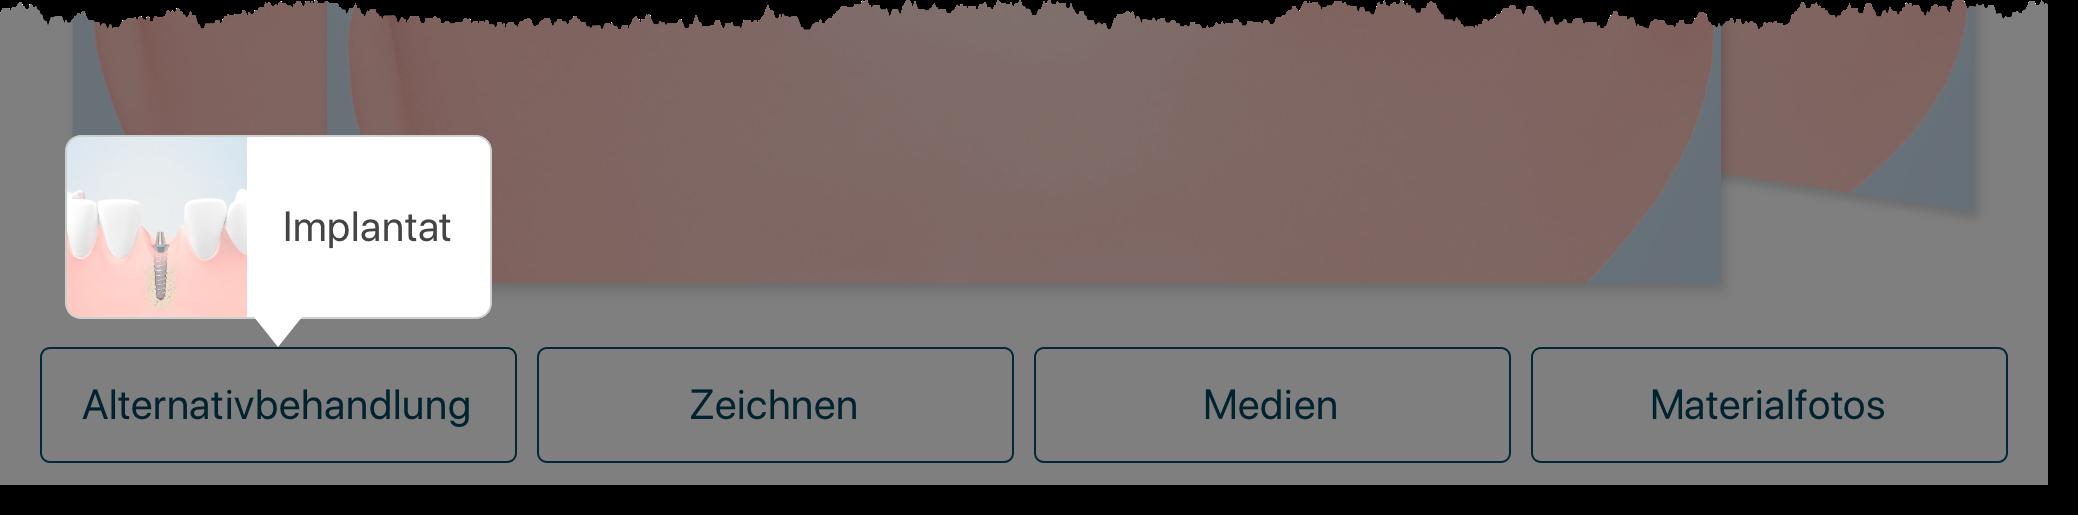 Athena-Beratung-Alternativbehandlung-Implantat